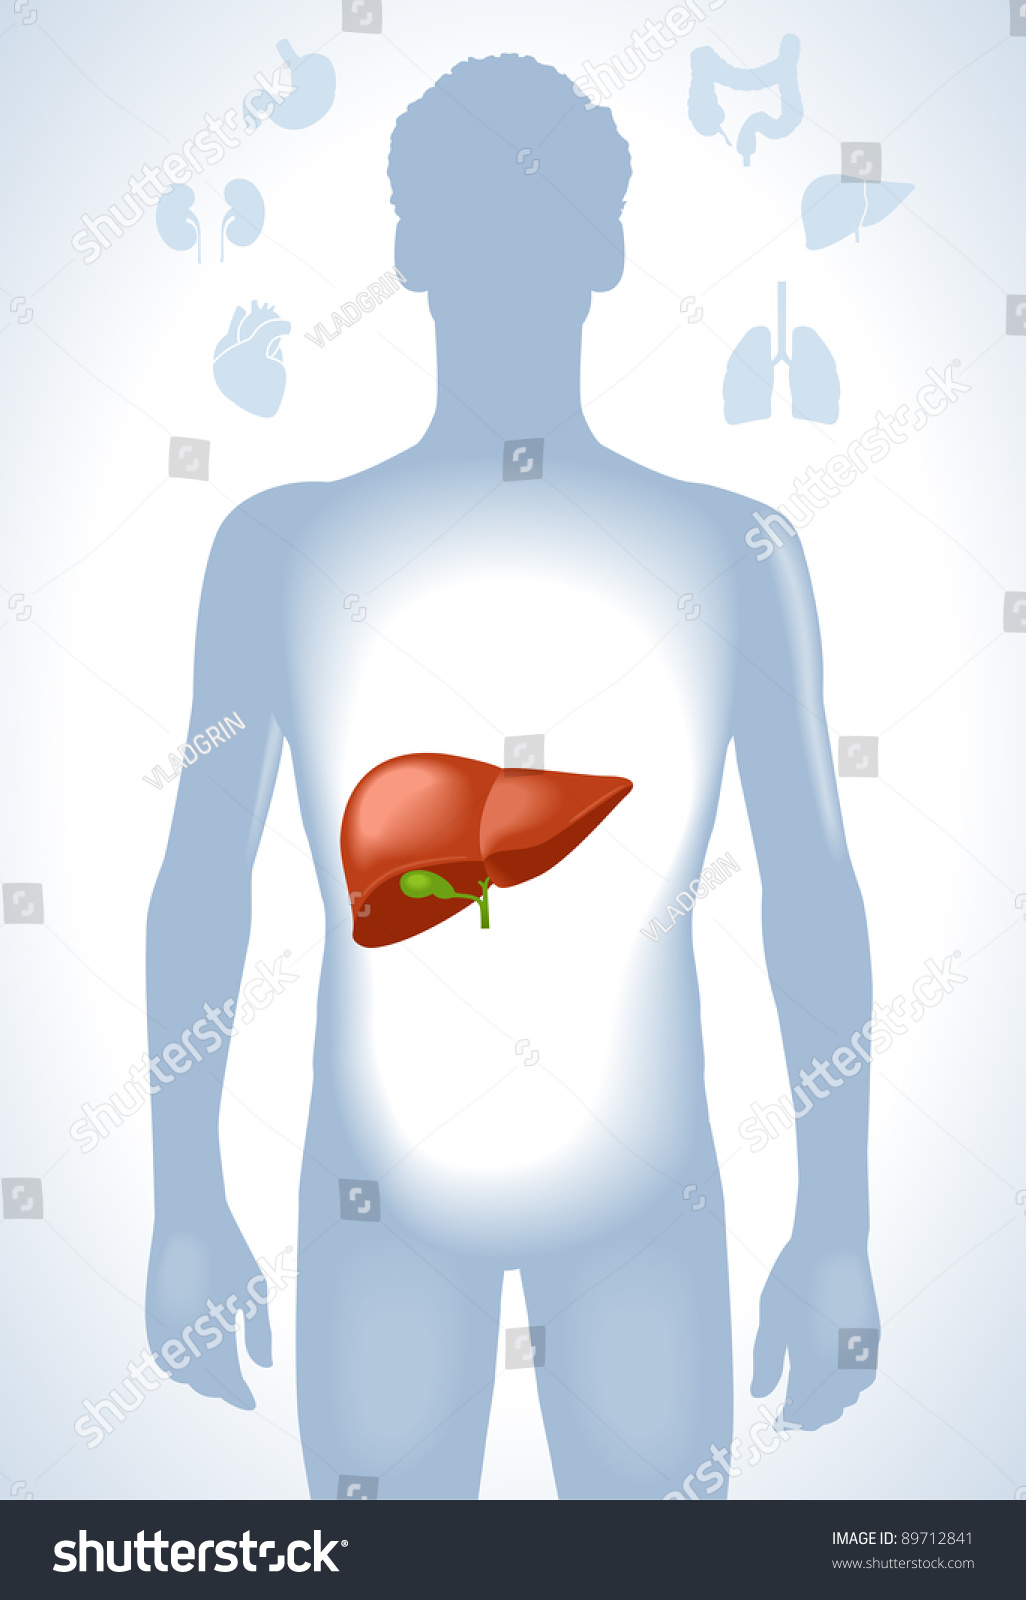 Set Human Anatomy Parts Liver Heart Stock Vector (2018) 89712841 ...